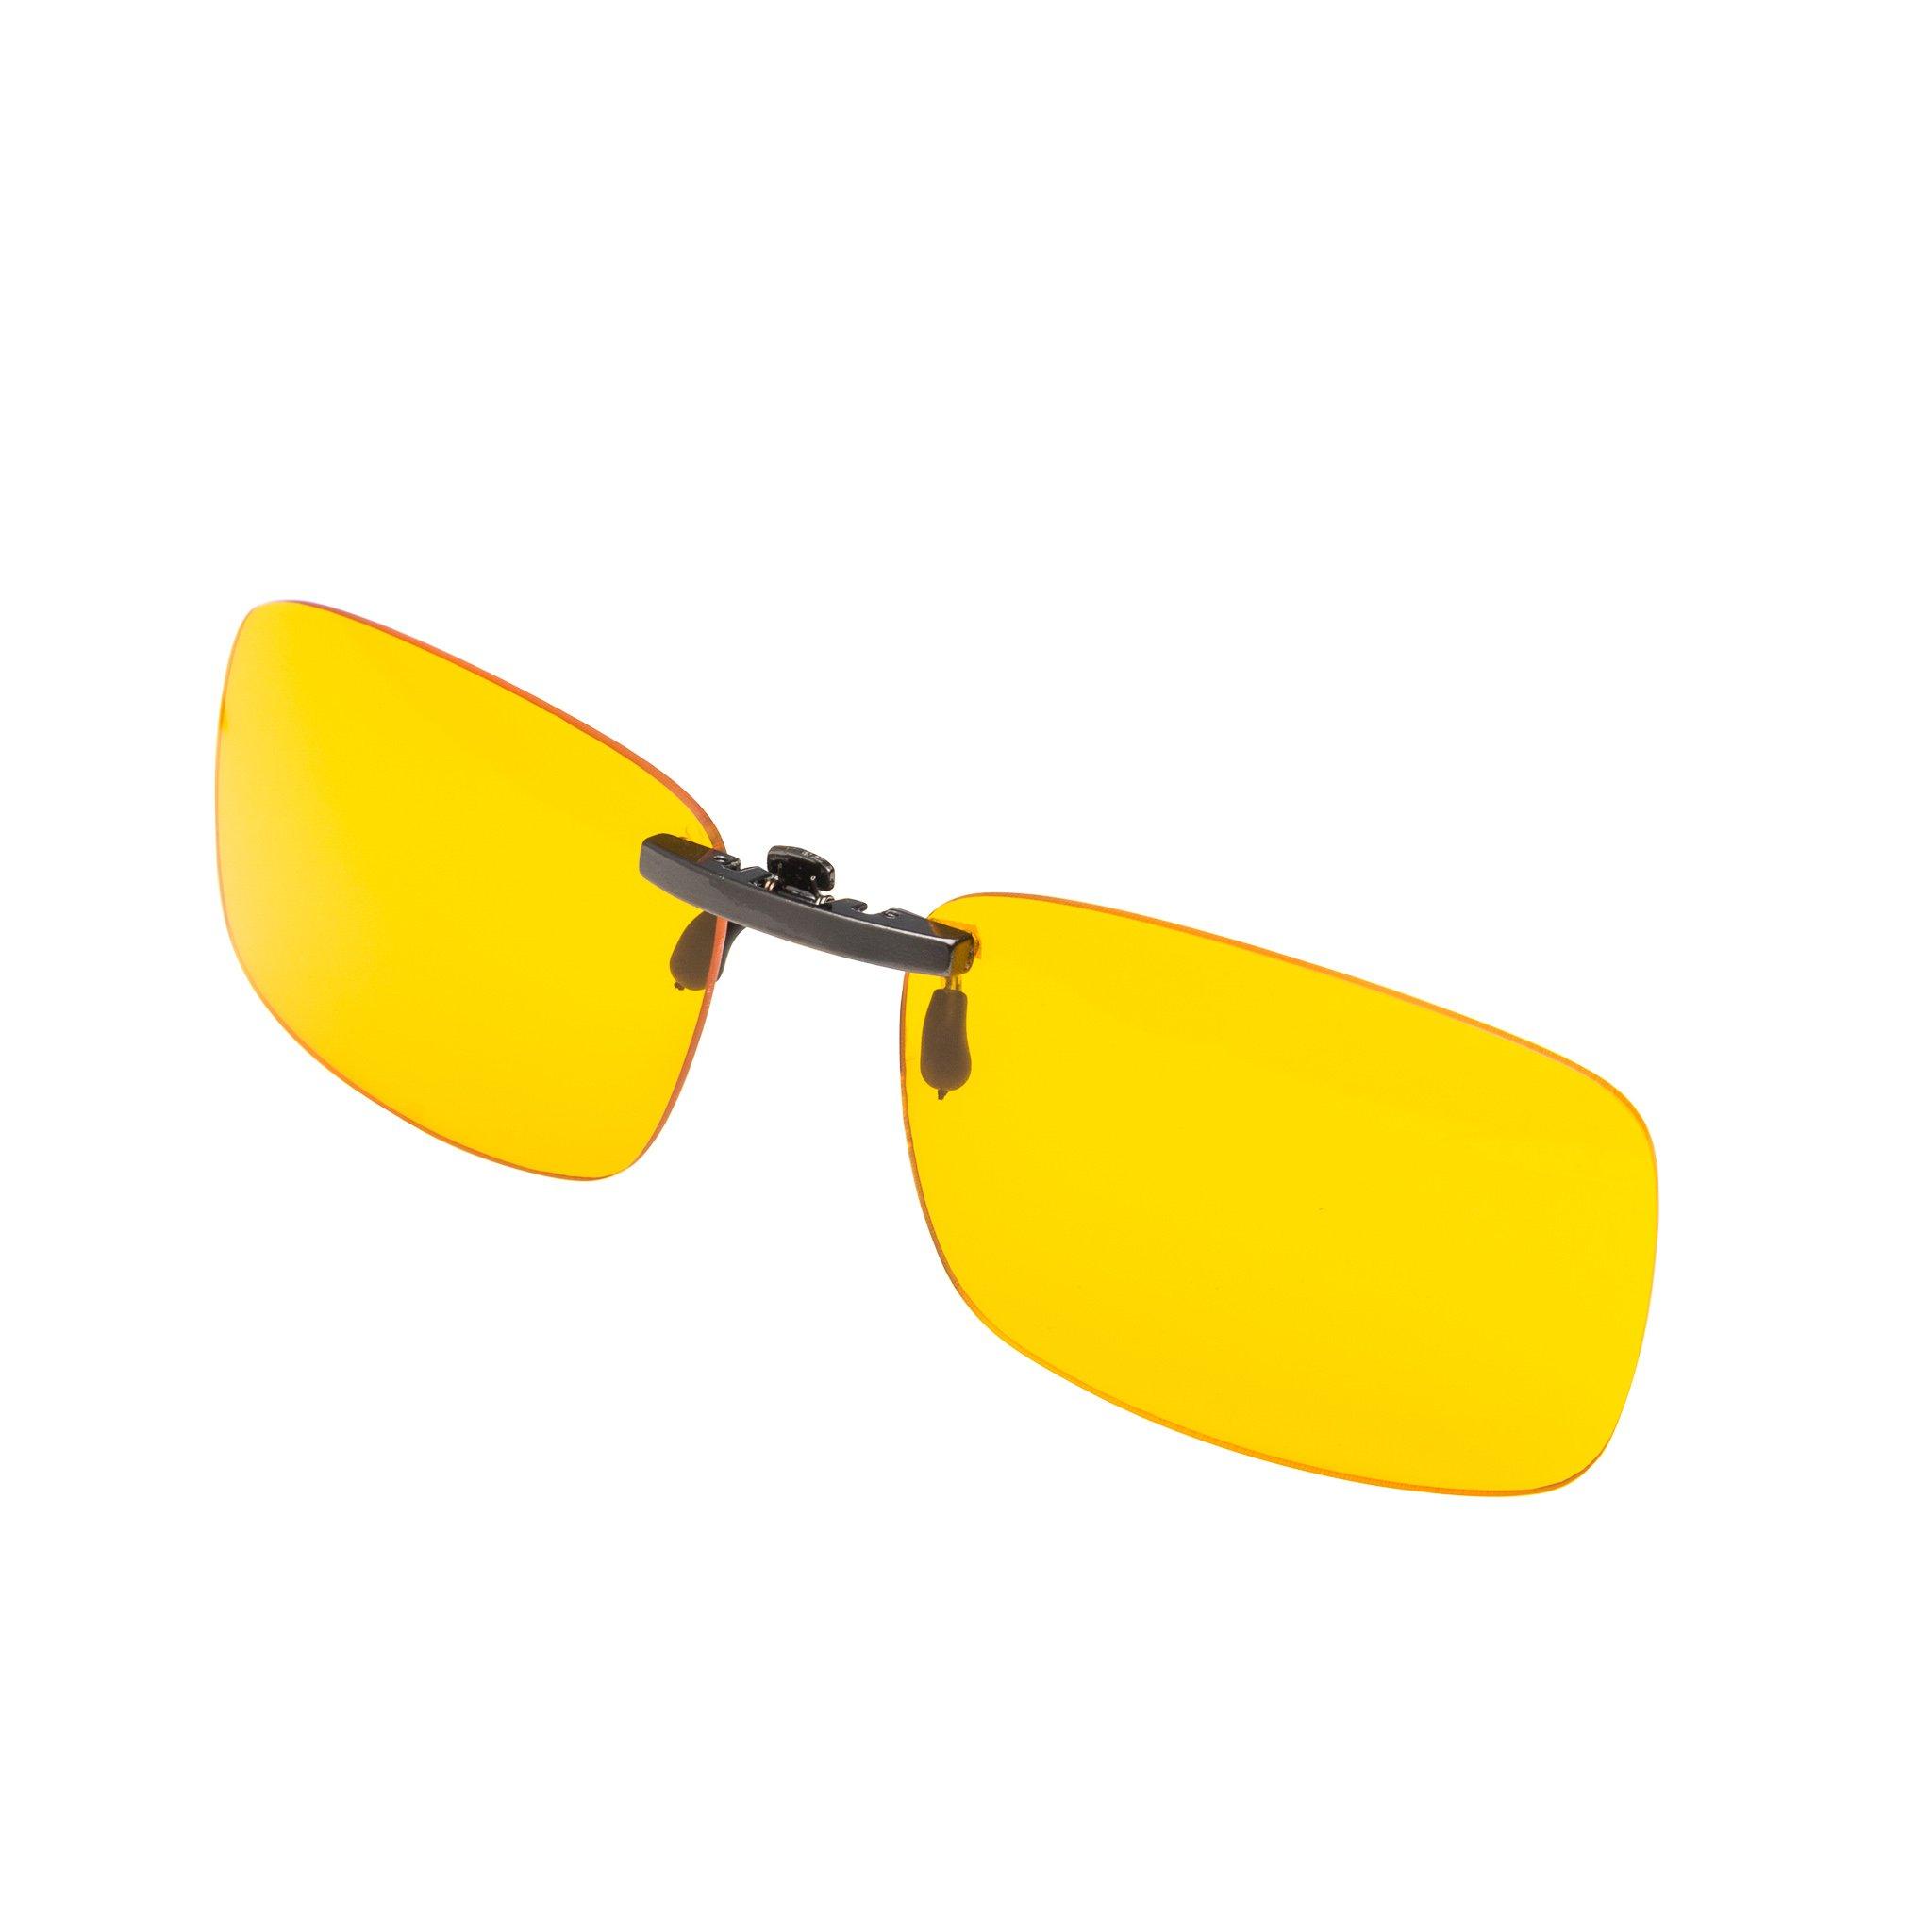 PROSPEK Computer Glasses - Blue Light Blocking Clip on - Elite